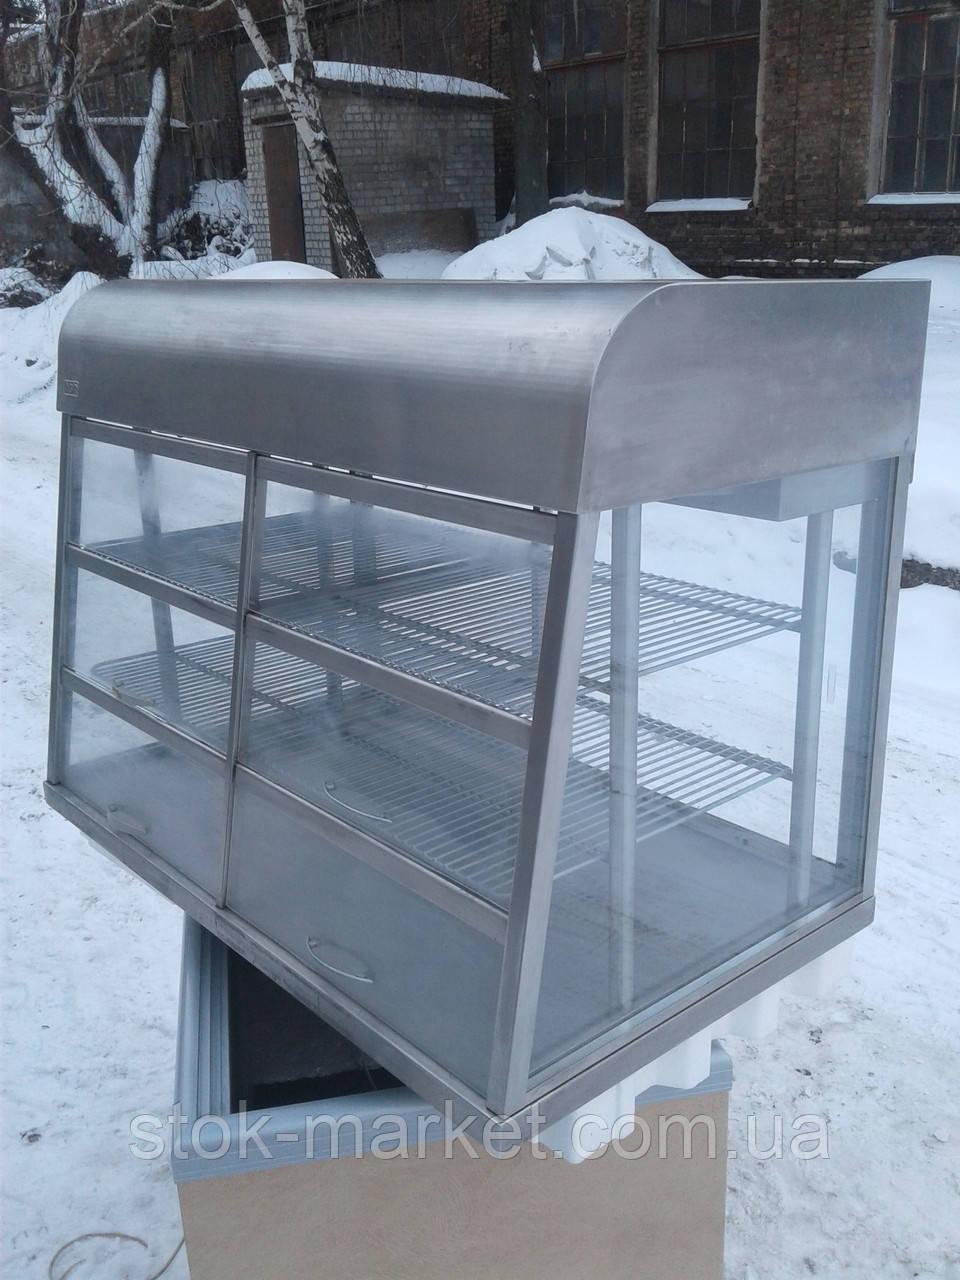 Холодильная витрина настольная Agir б/у, настольная витрина холодильная б у, витрина холодильная б/у